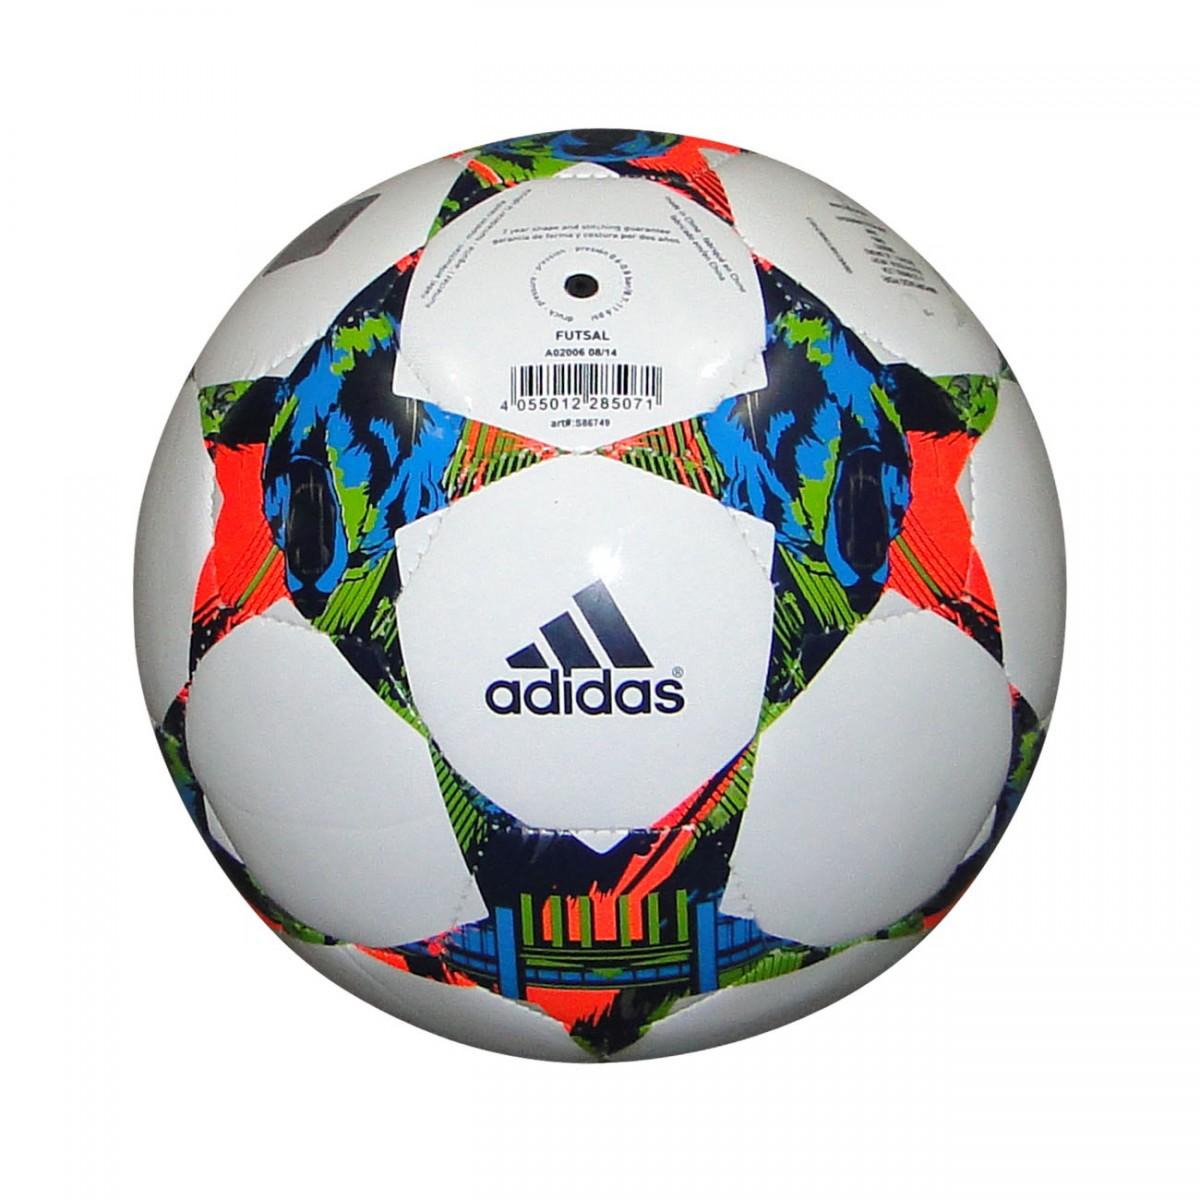 19a064f07686d Bola Adidas Finale Berlin 2015 Futsal S86749 - Branco Multicolor ...